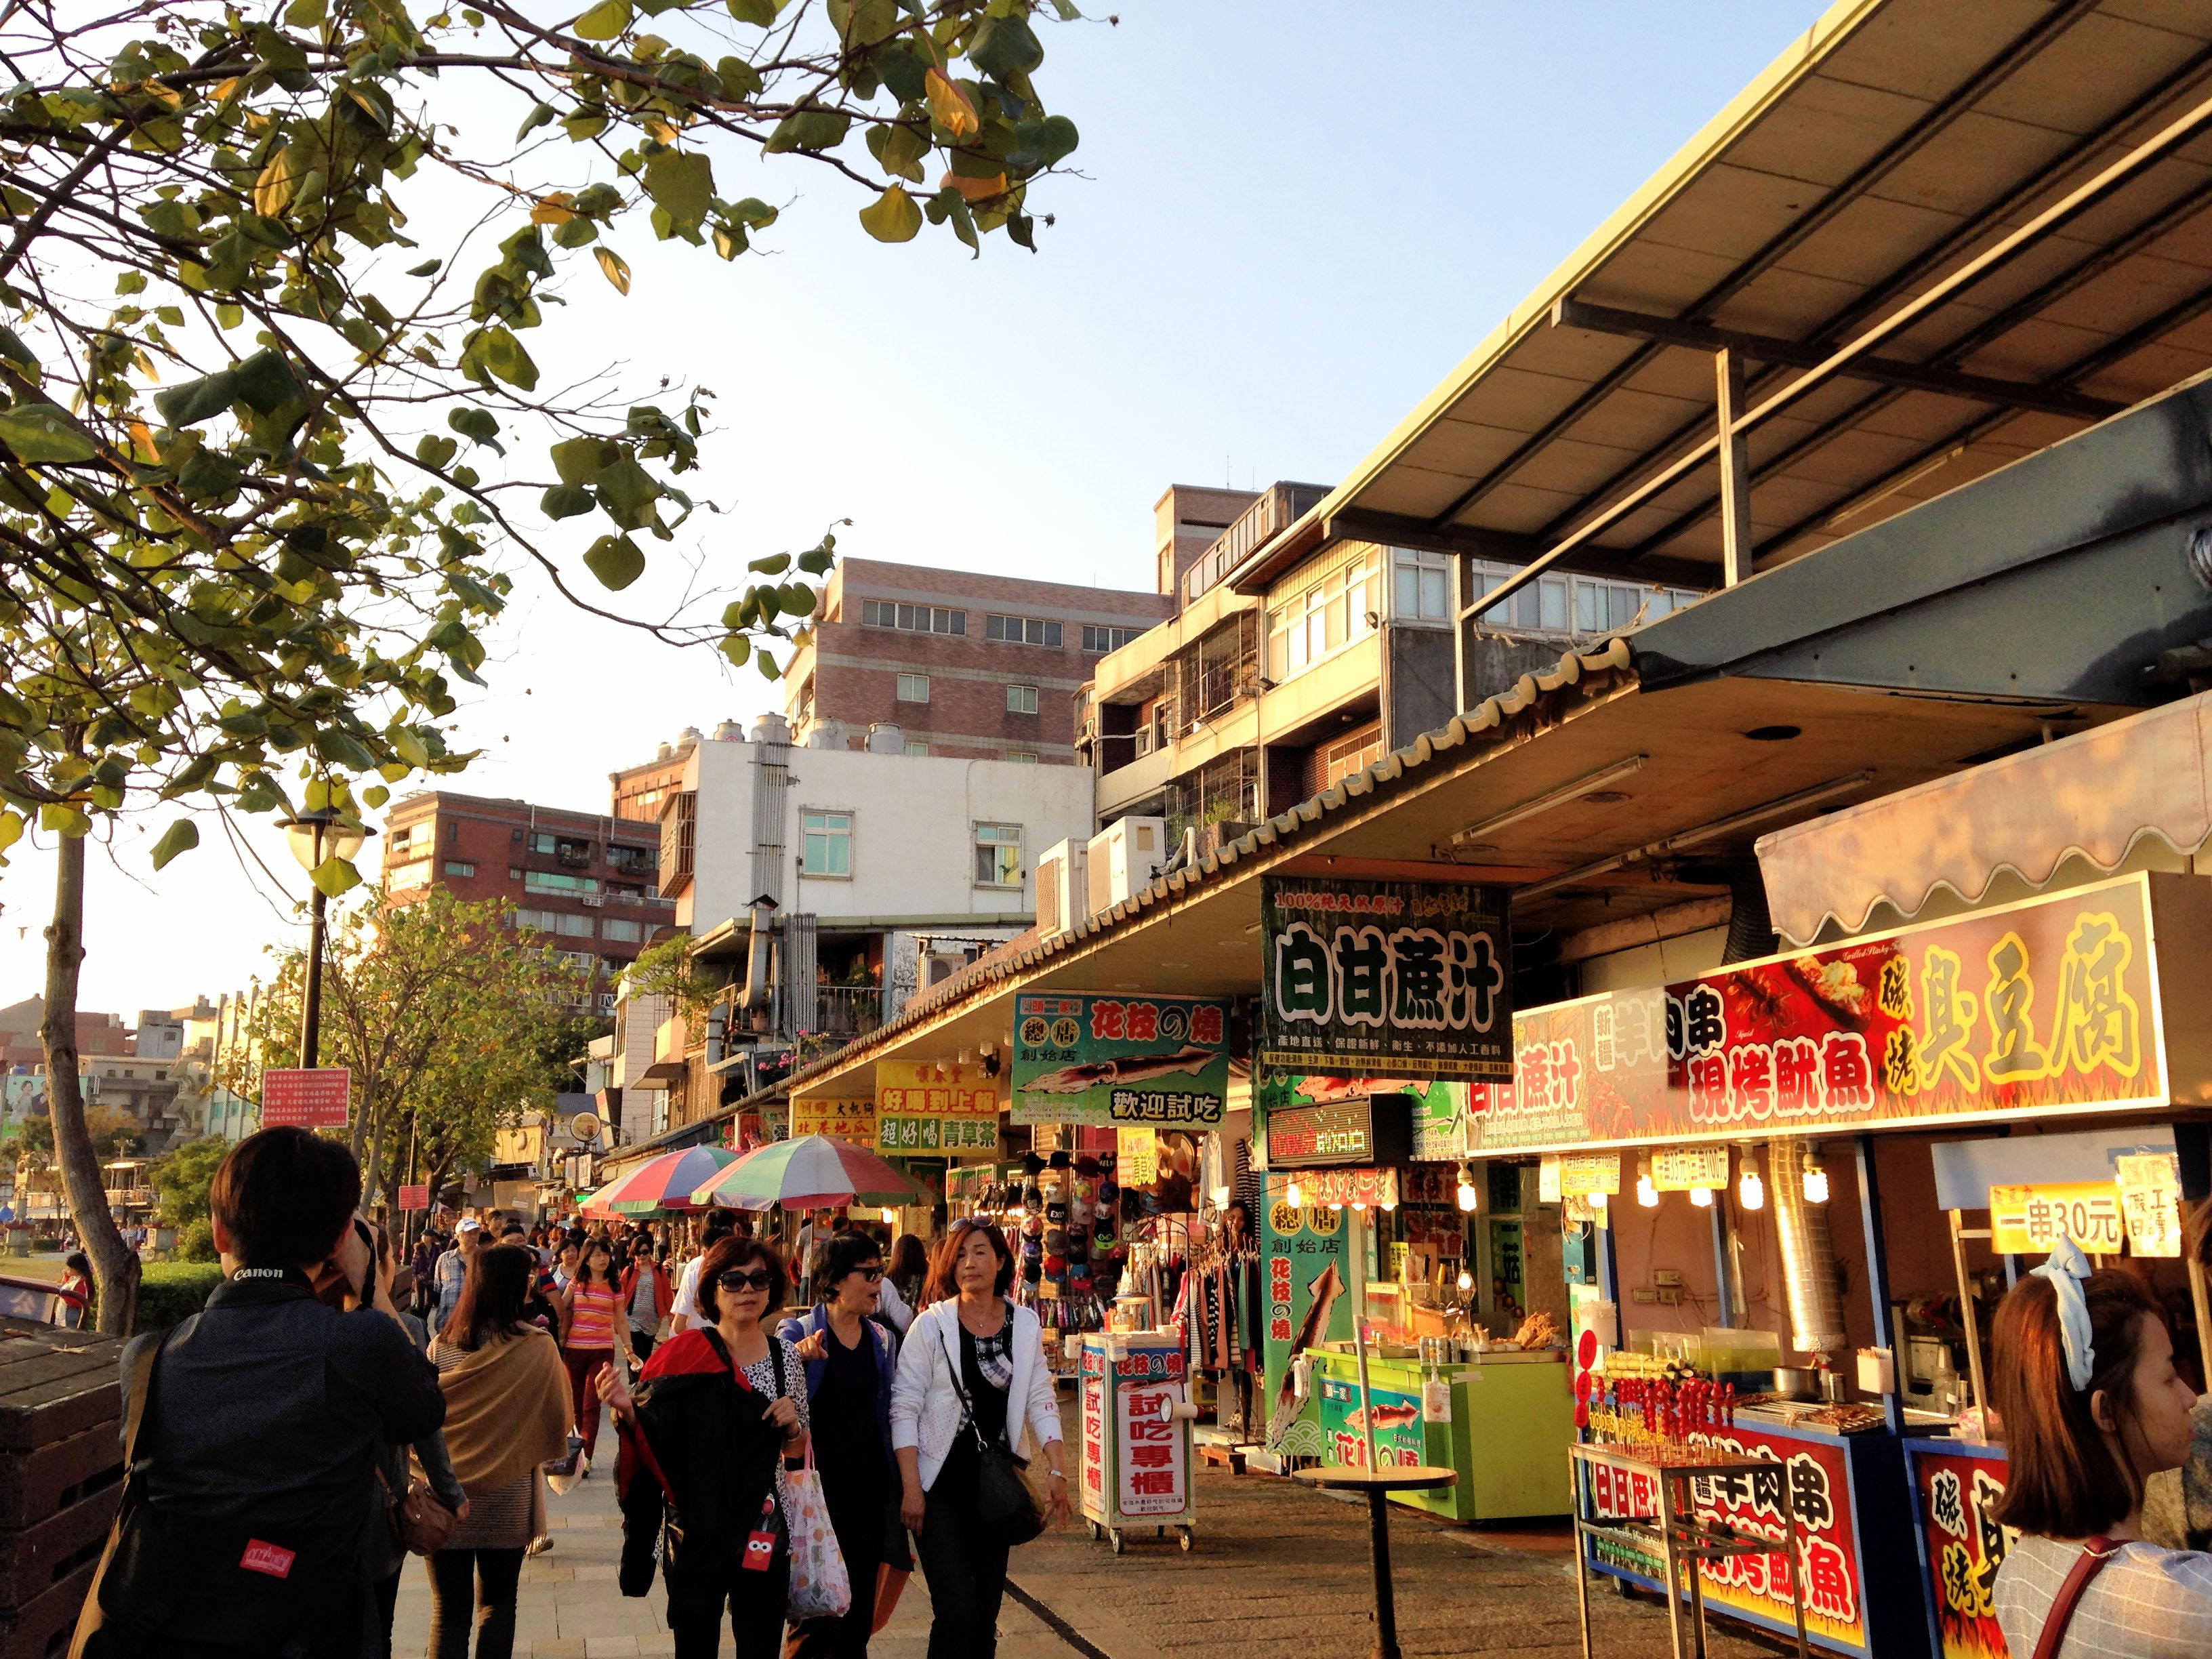 Tamsui [Danshui] Old Street (淡水老街).